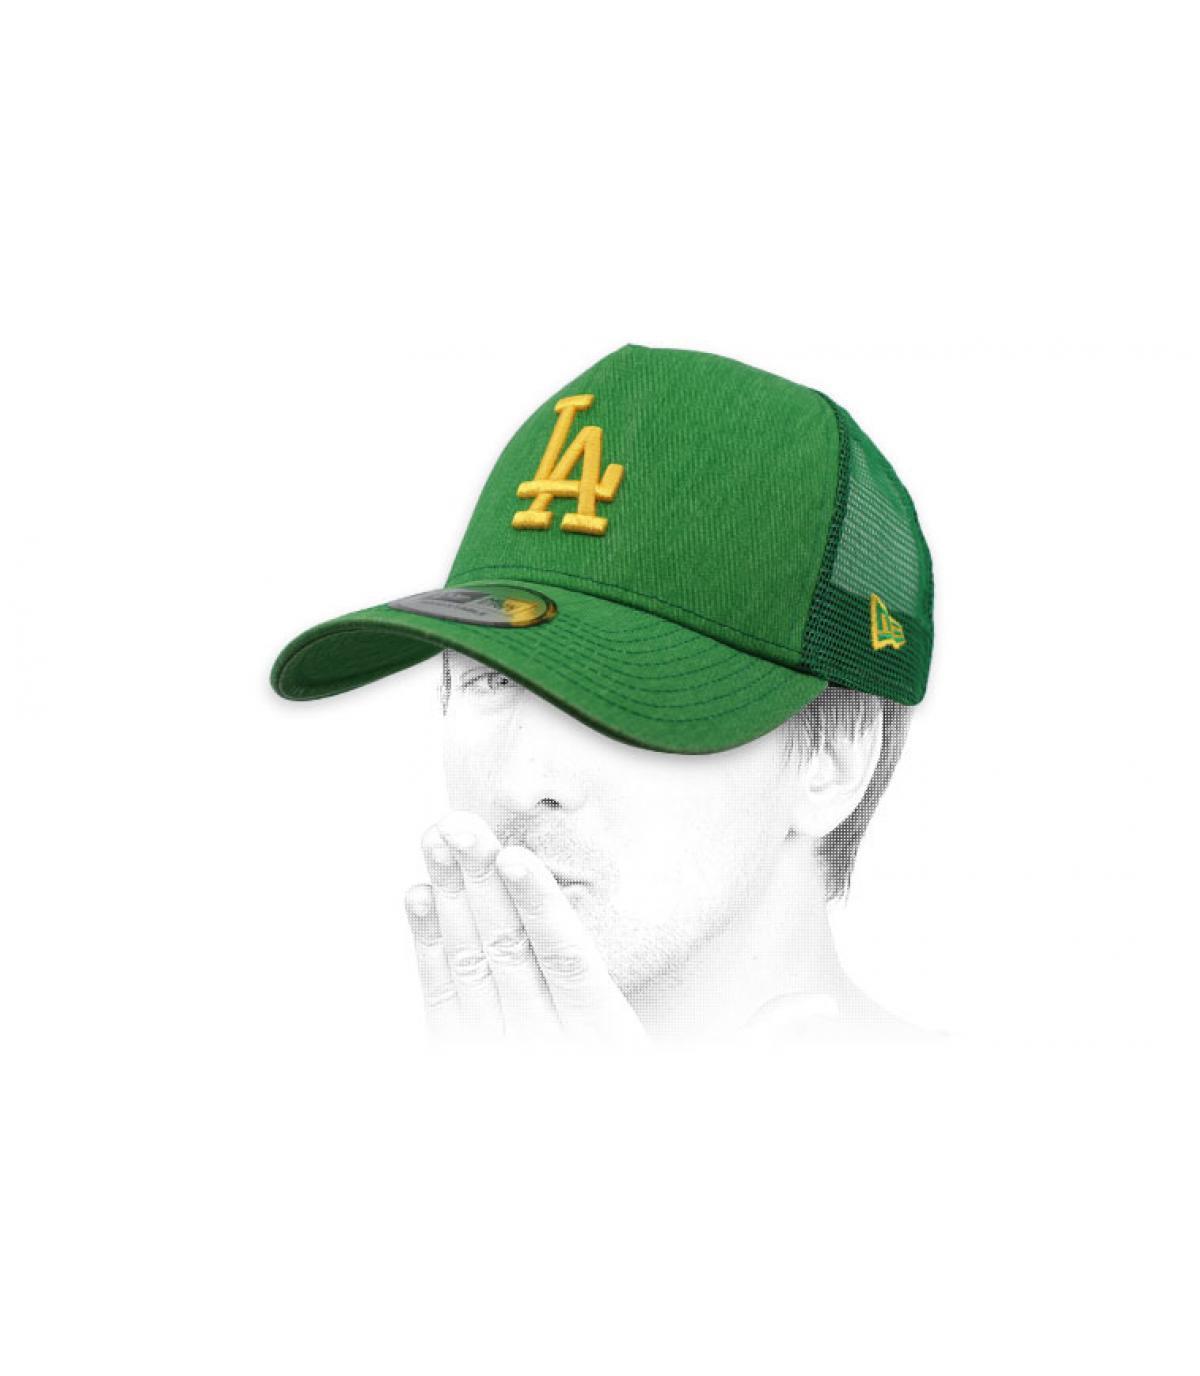 green yellow LA trucker